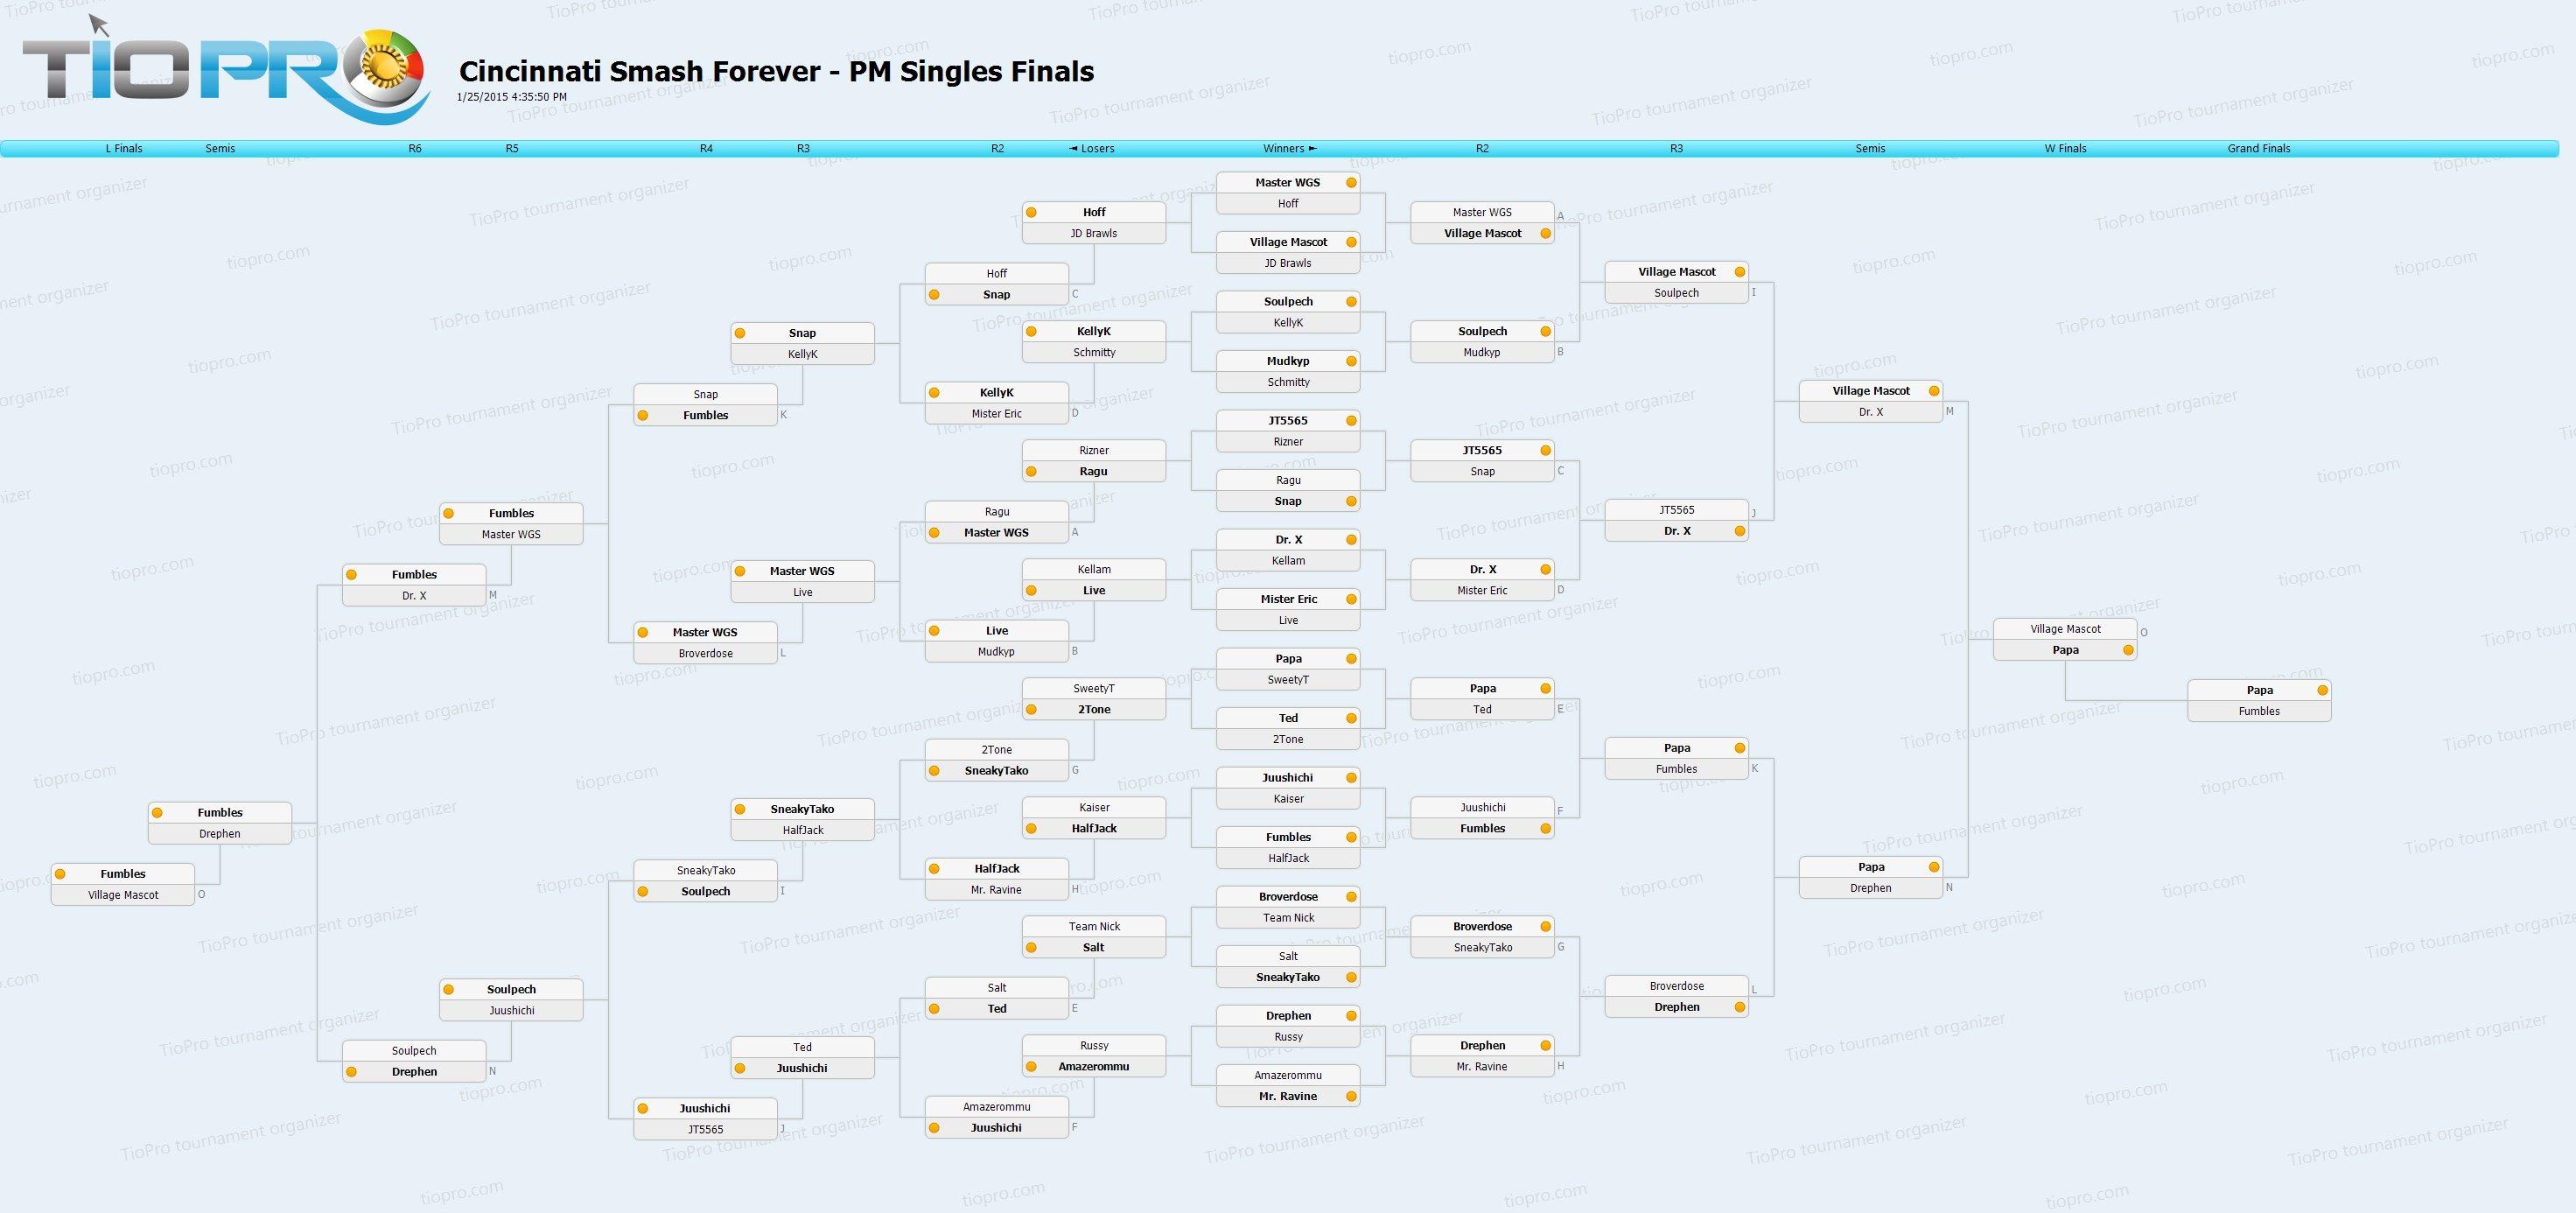 Cincinnati Smash Forever - PM Singles Finals